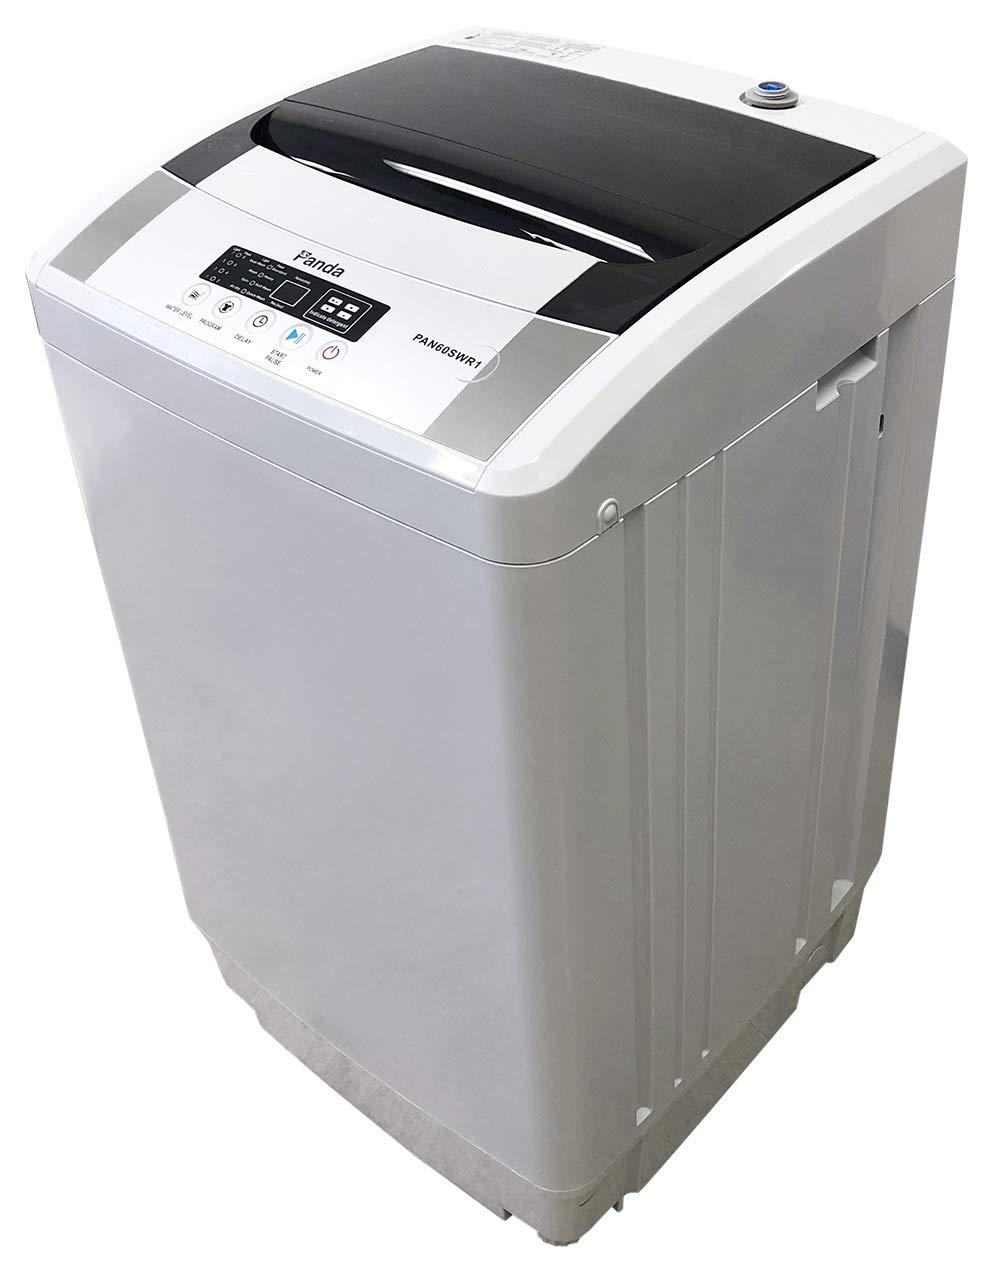 Panda PAN60SWR1 13LB Compact Portable Washing Machine